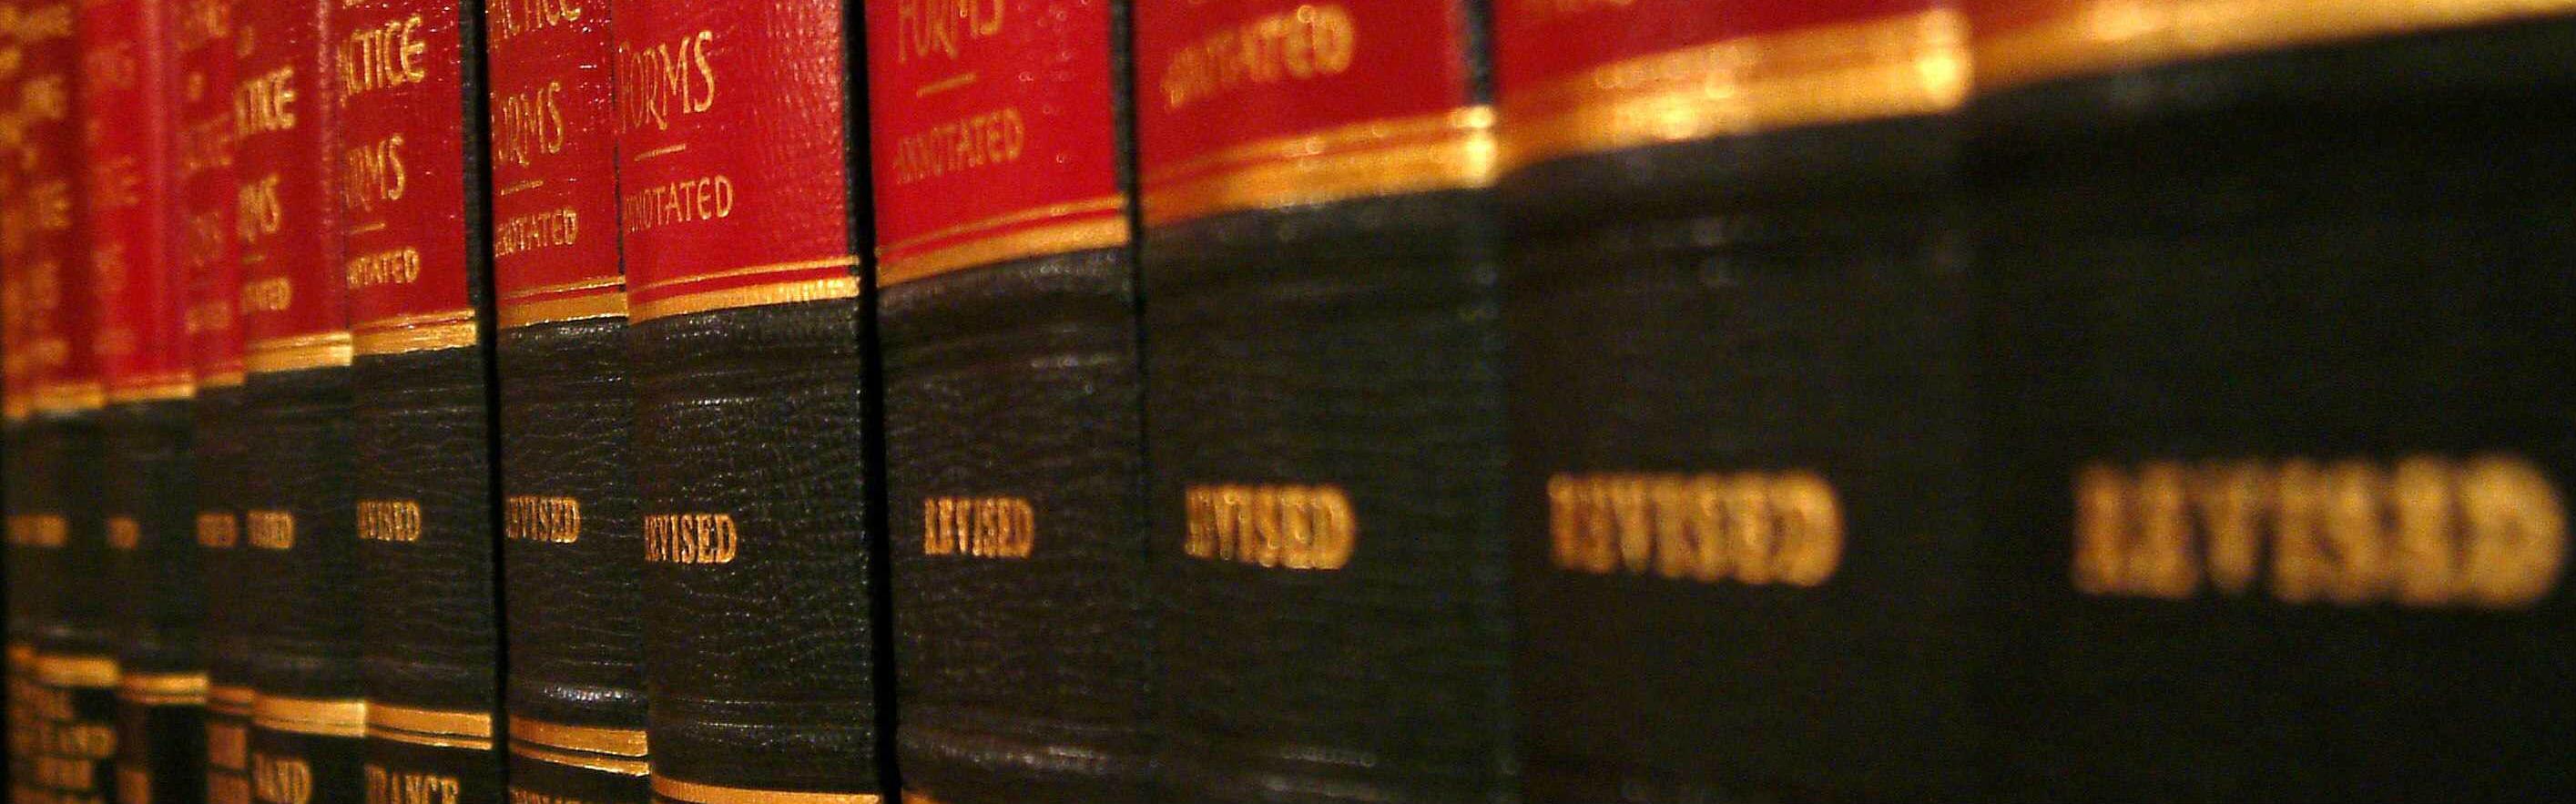 IST/Sociesc promove a II Jornada Jurídica debatendo o mercado e direitos fundamentais